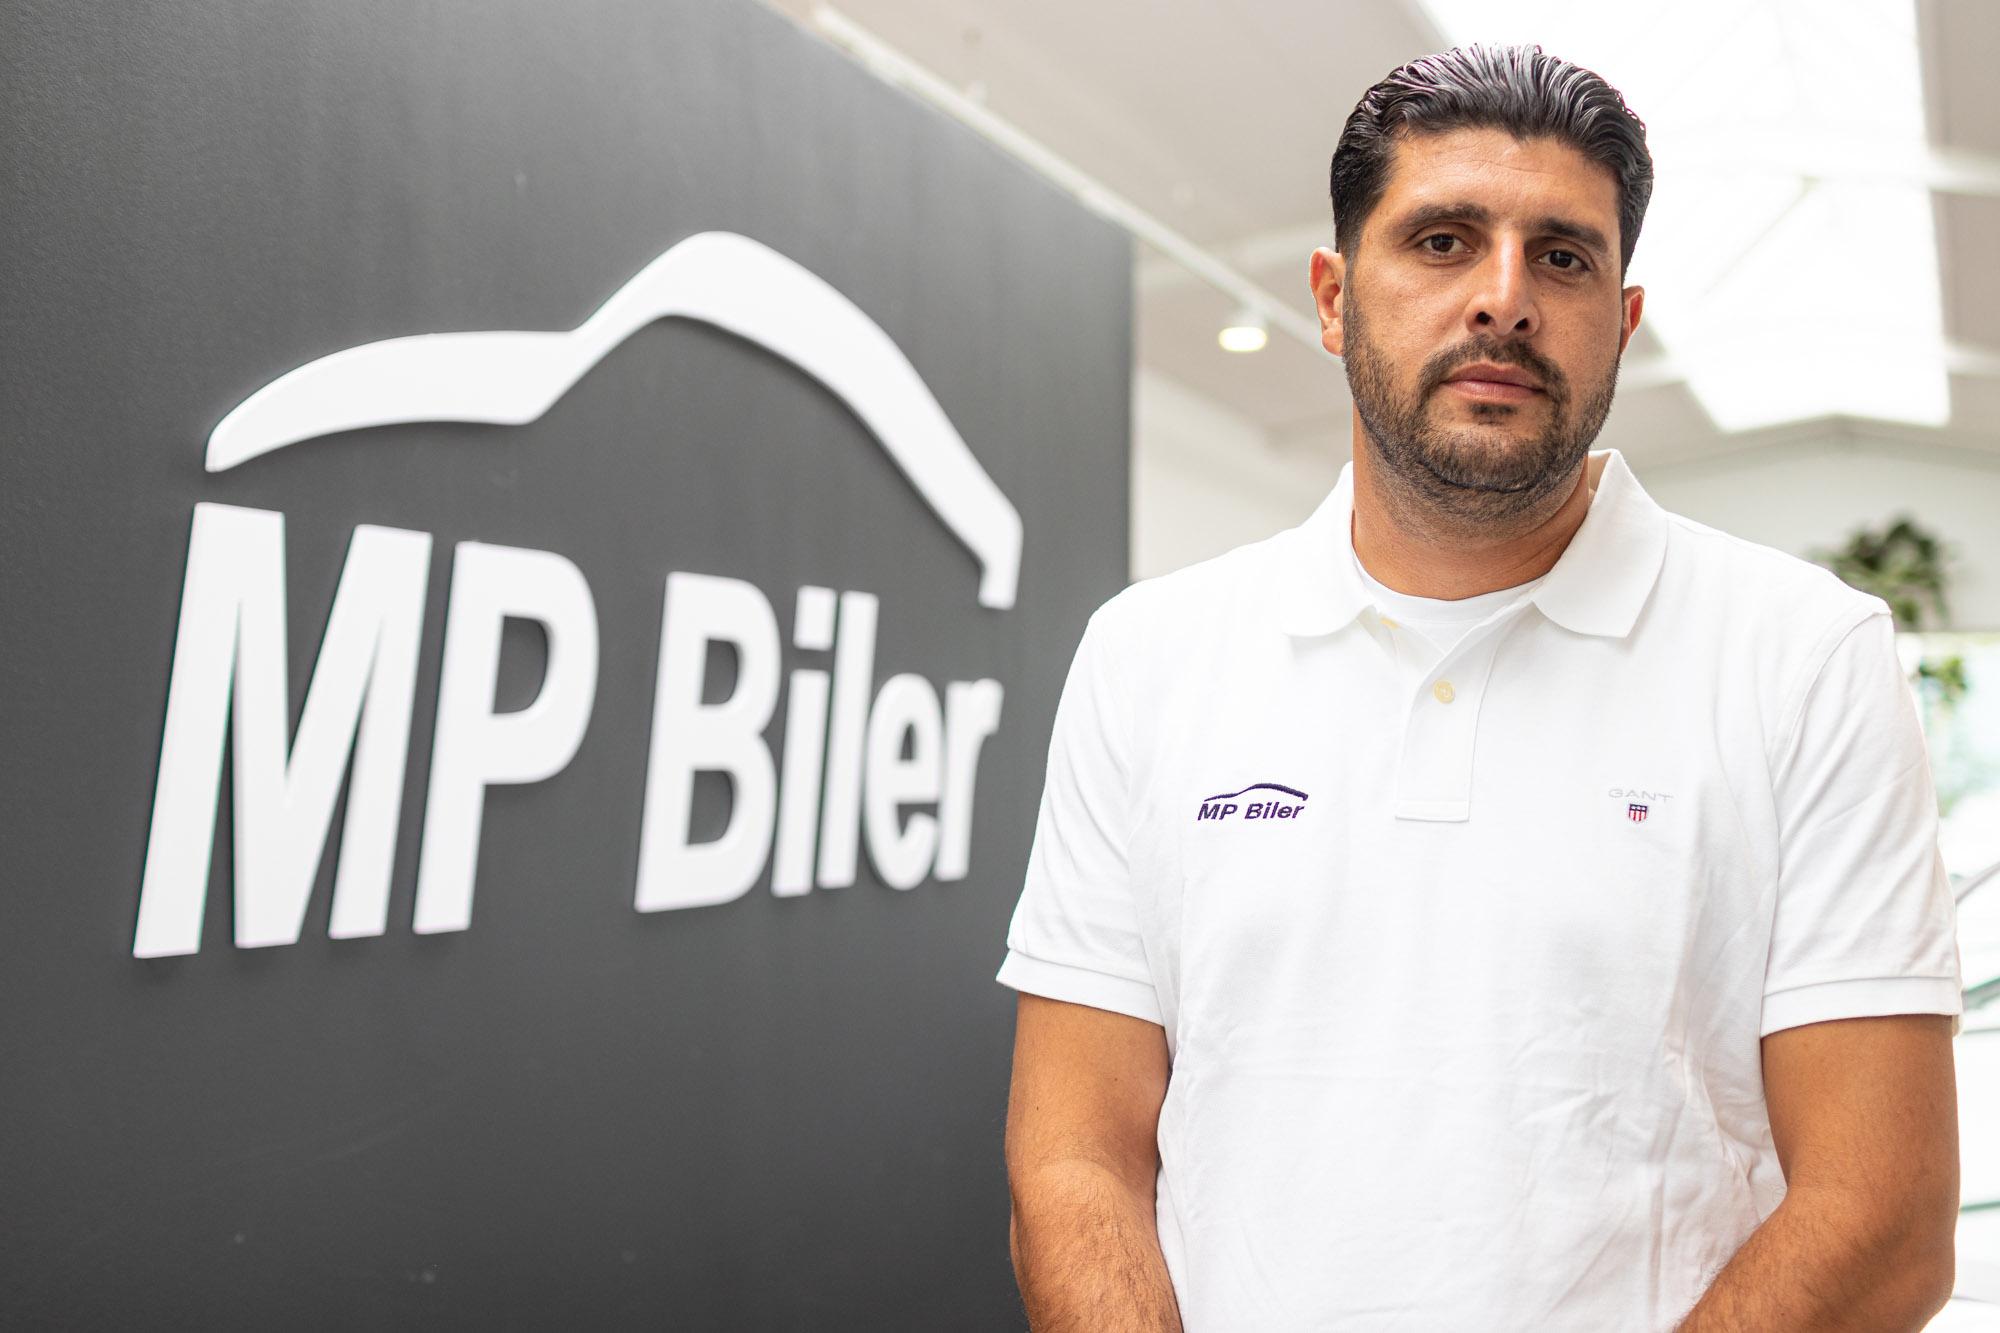 Mustafa Pelit